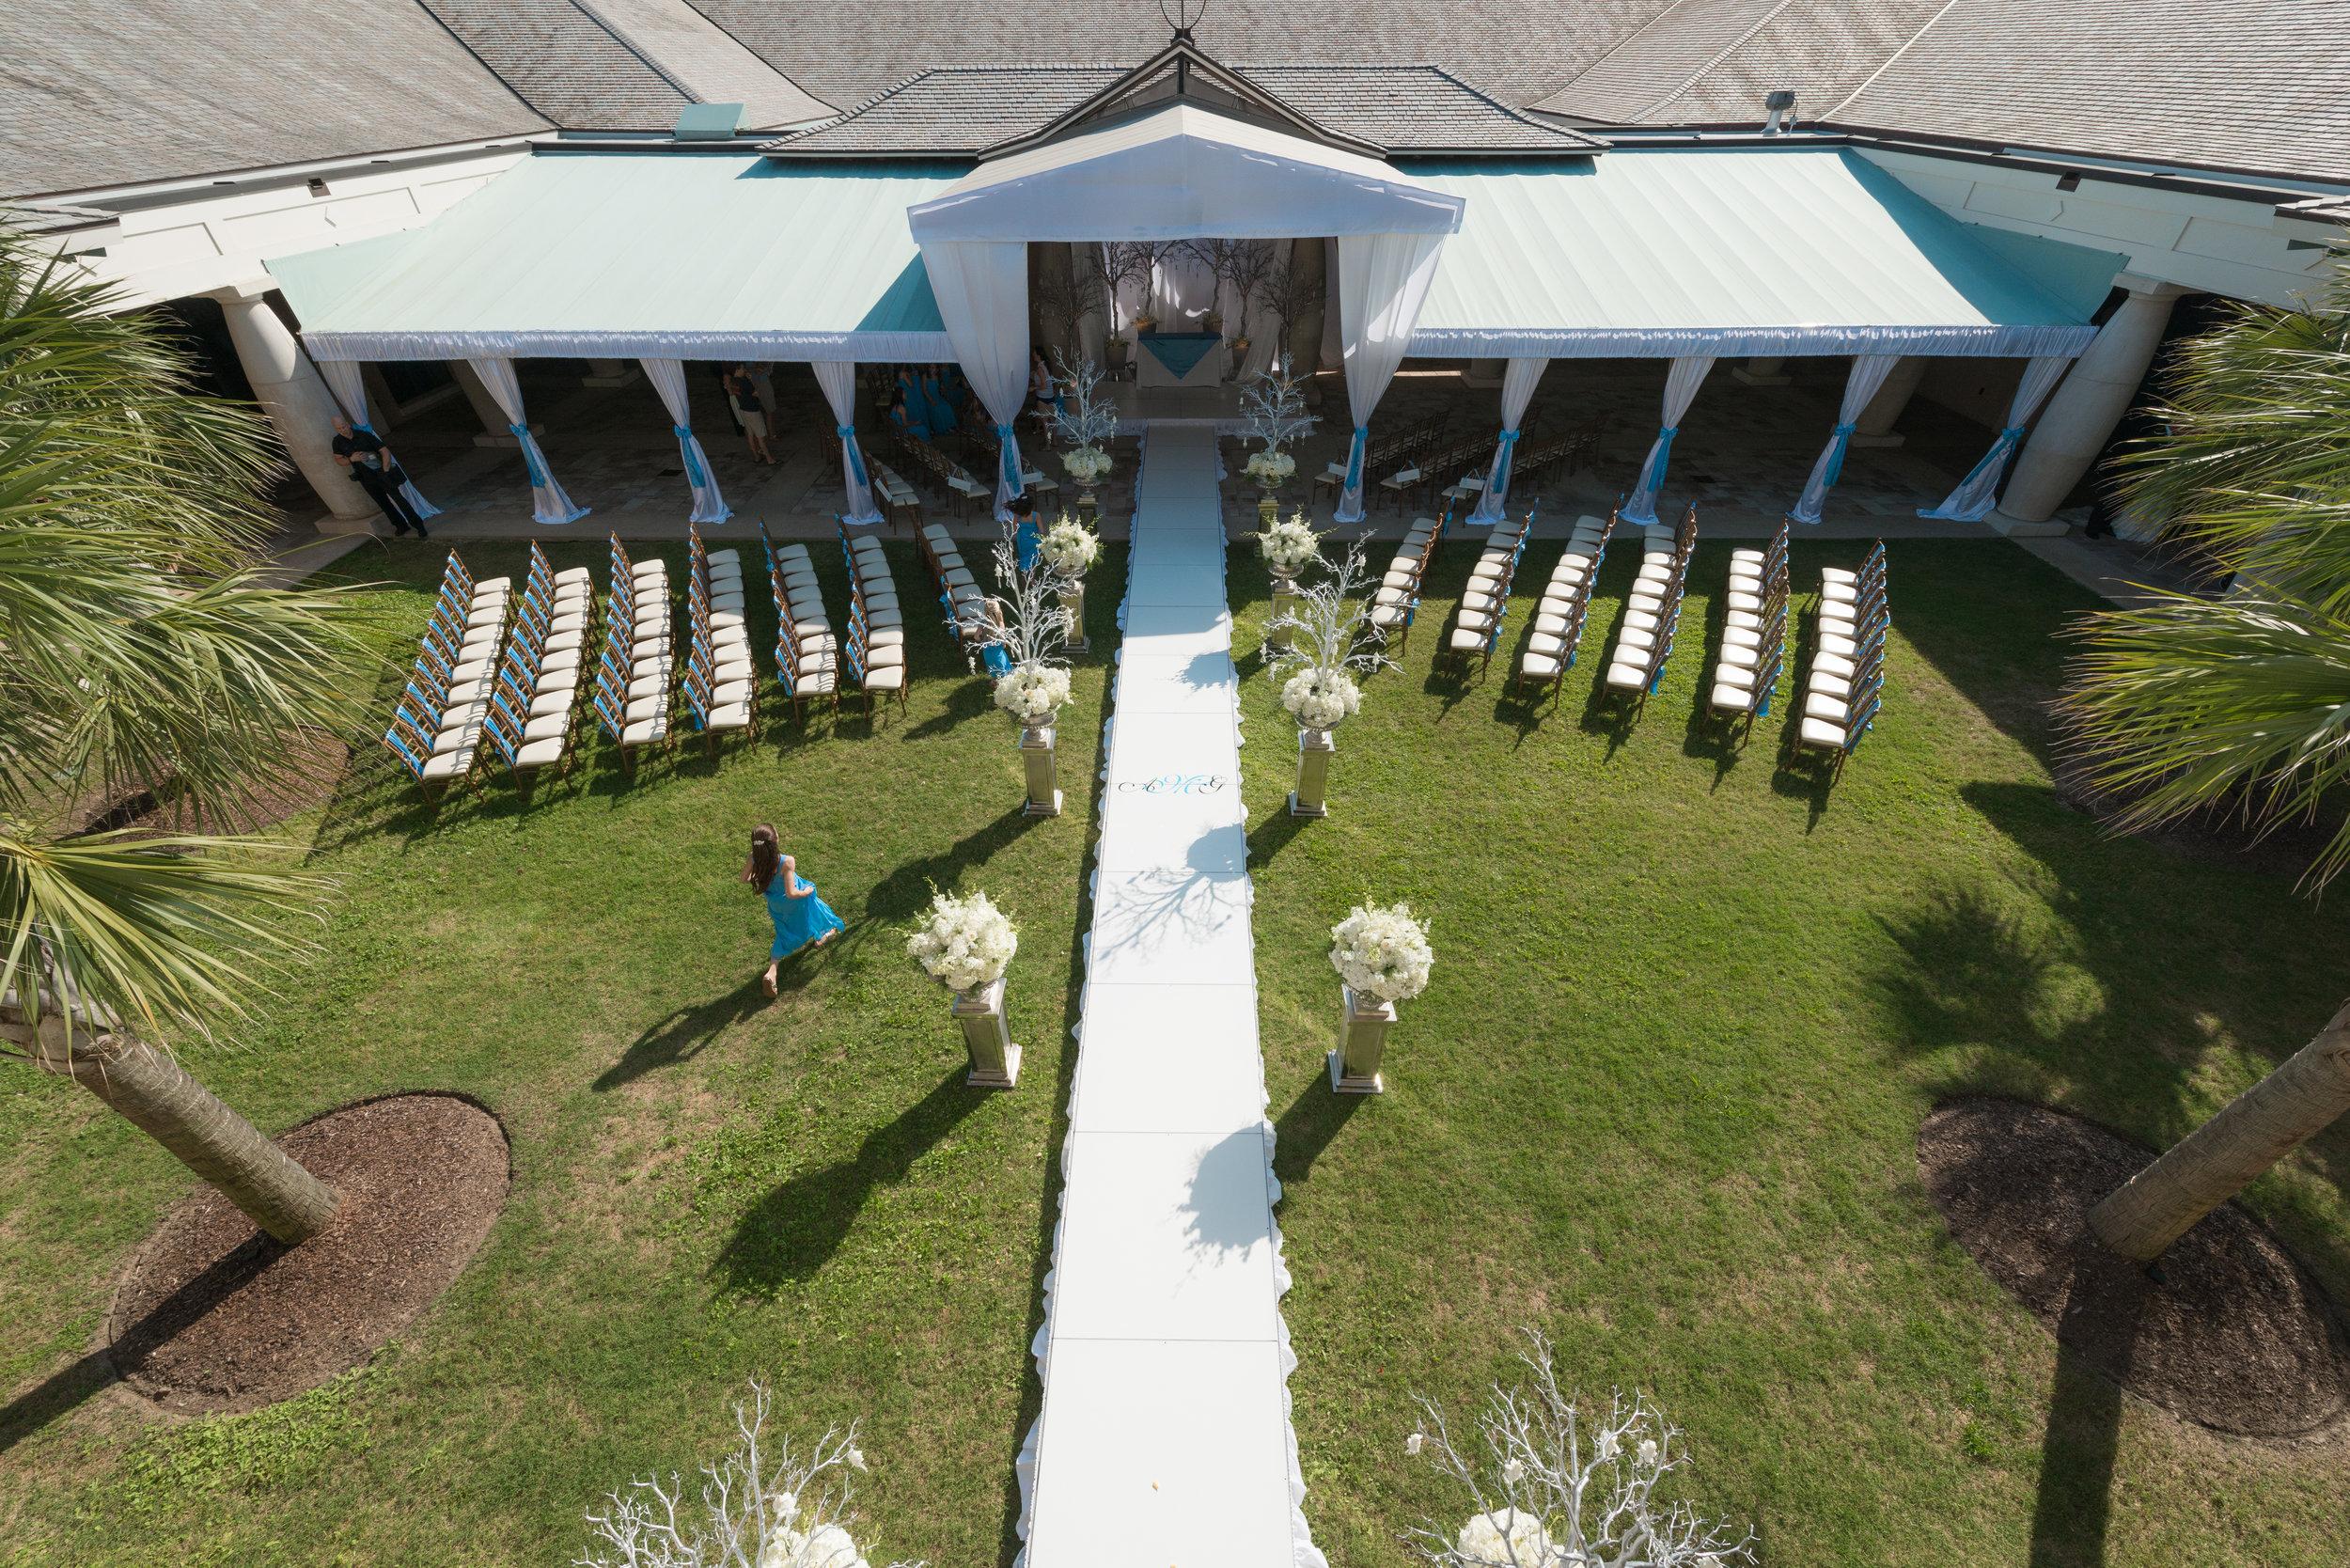 Carl-Kerridge-Photography-North-Beach-Wedding-May-2015-055.jpg